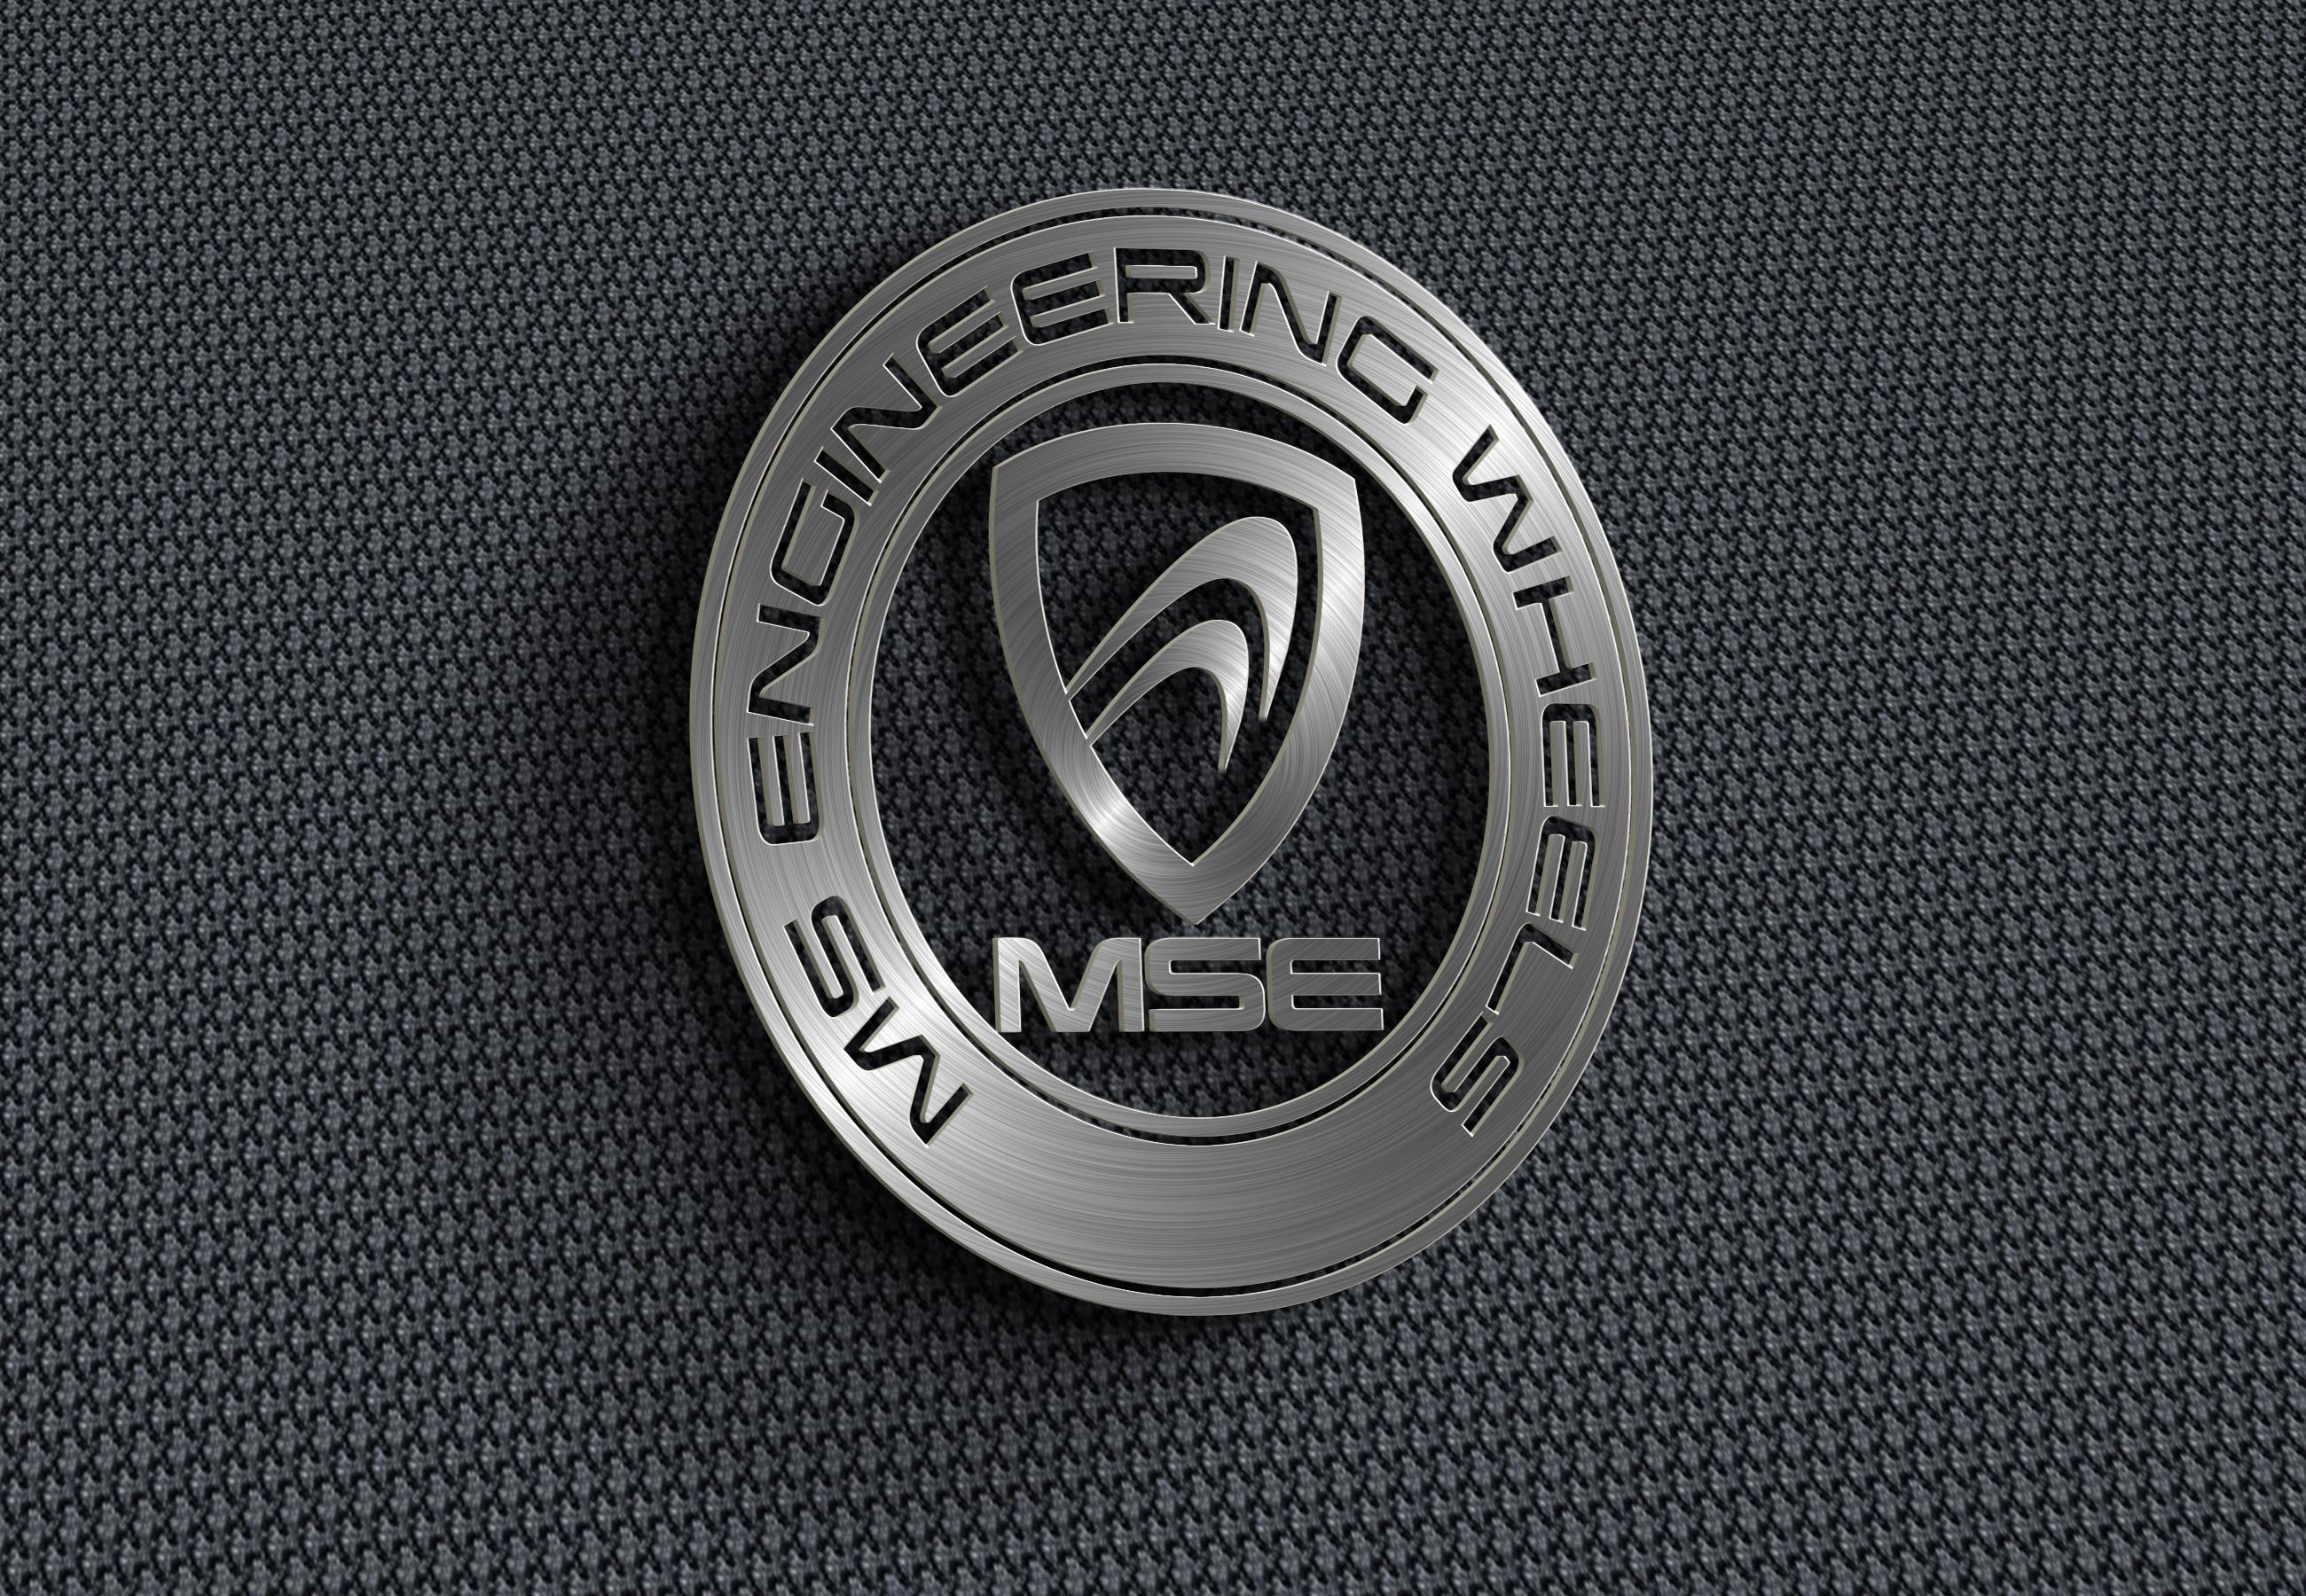 野马升级MSE WheeIs 轮毂 Brembo GT